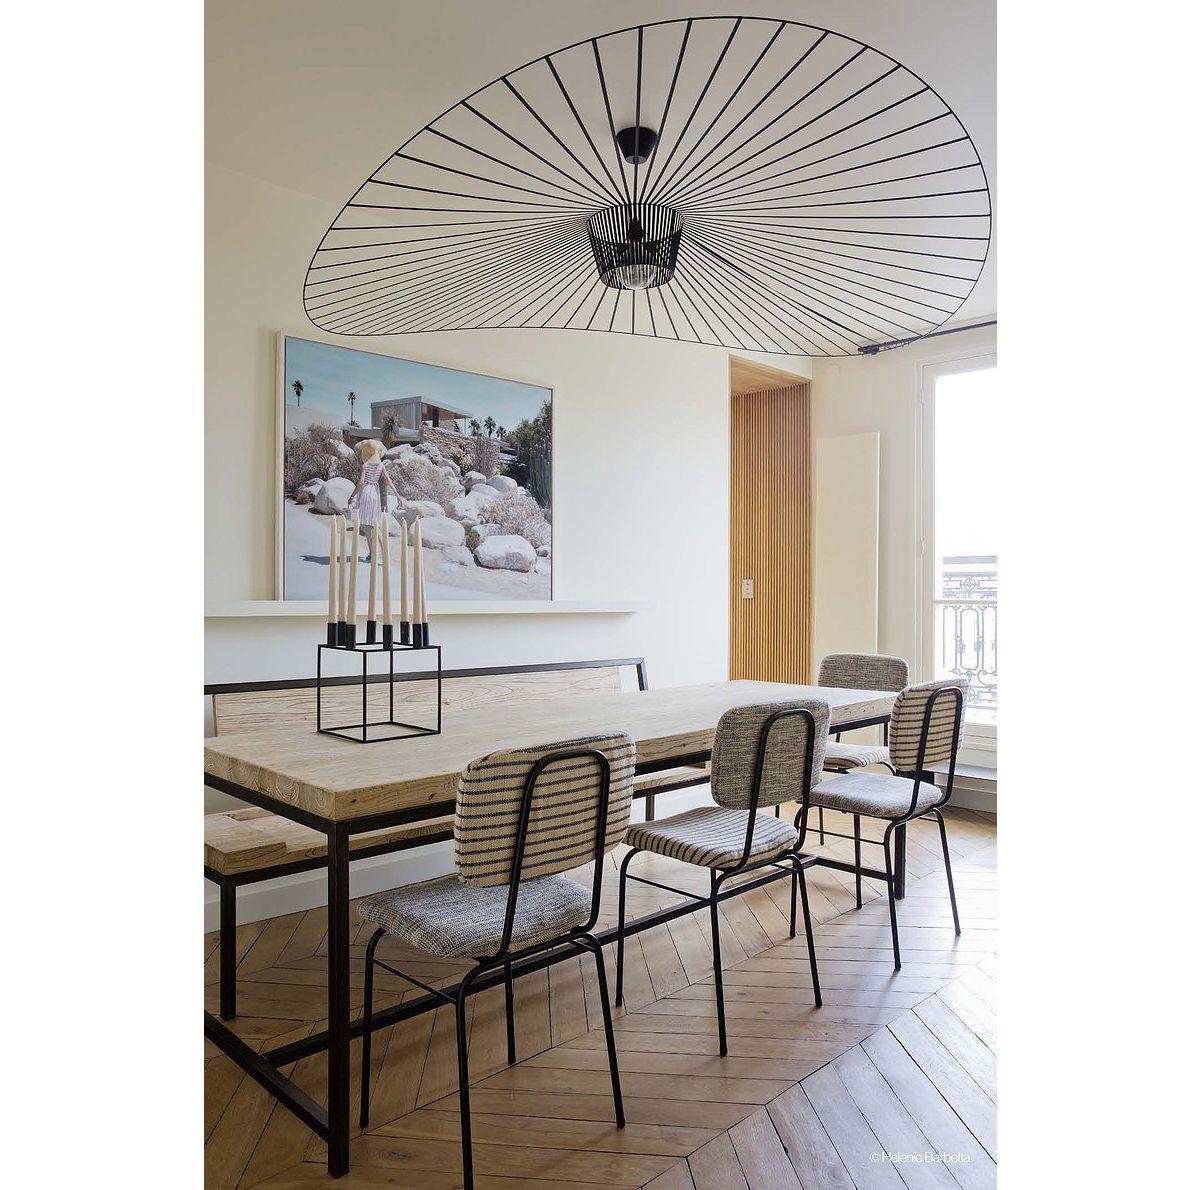 Ampoule Vertigo Petite Friture suspension vertigo : 10 modèles du même style - 31m2